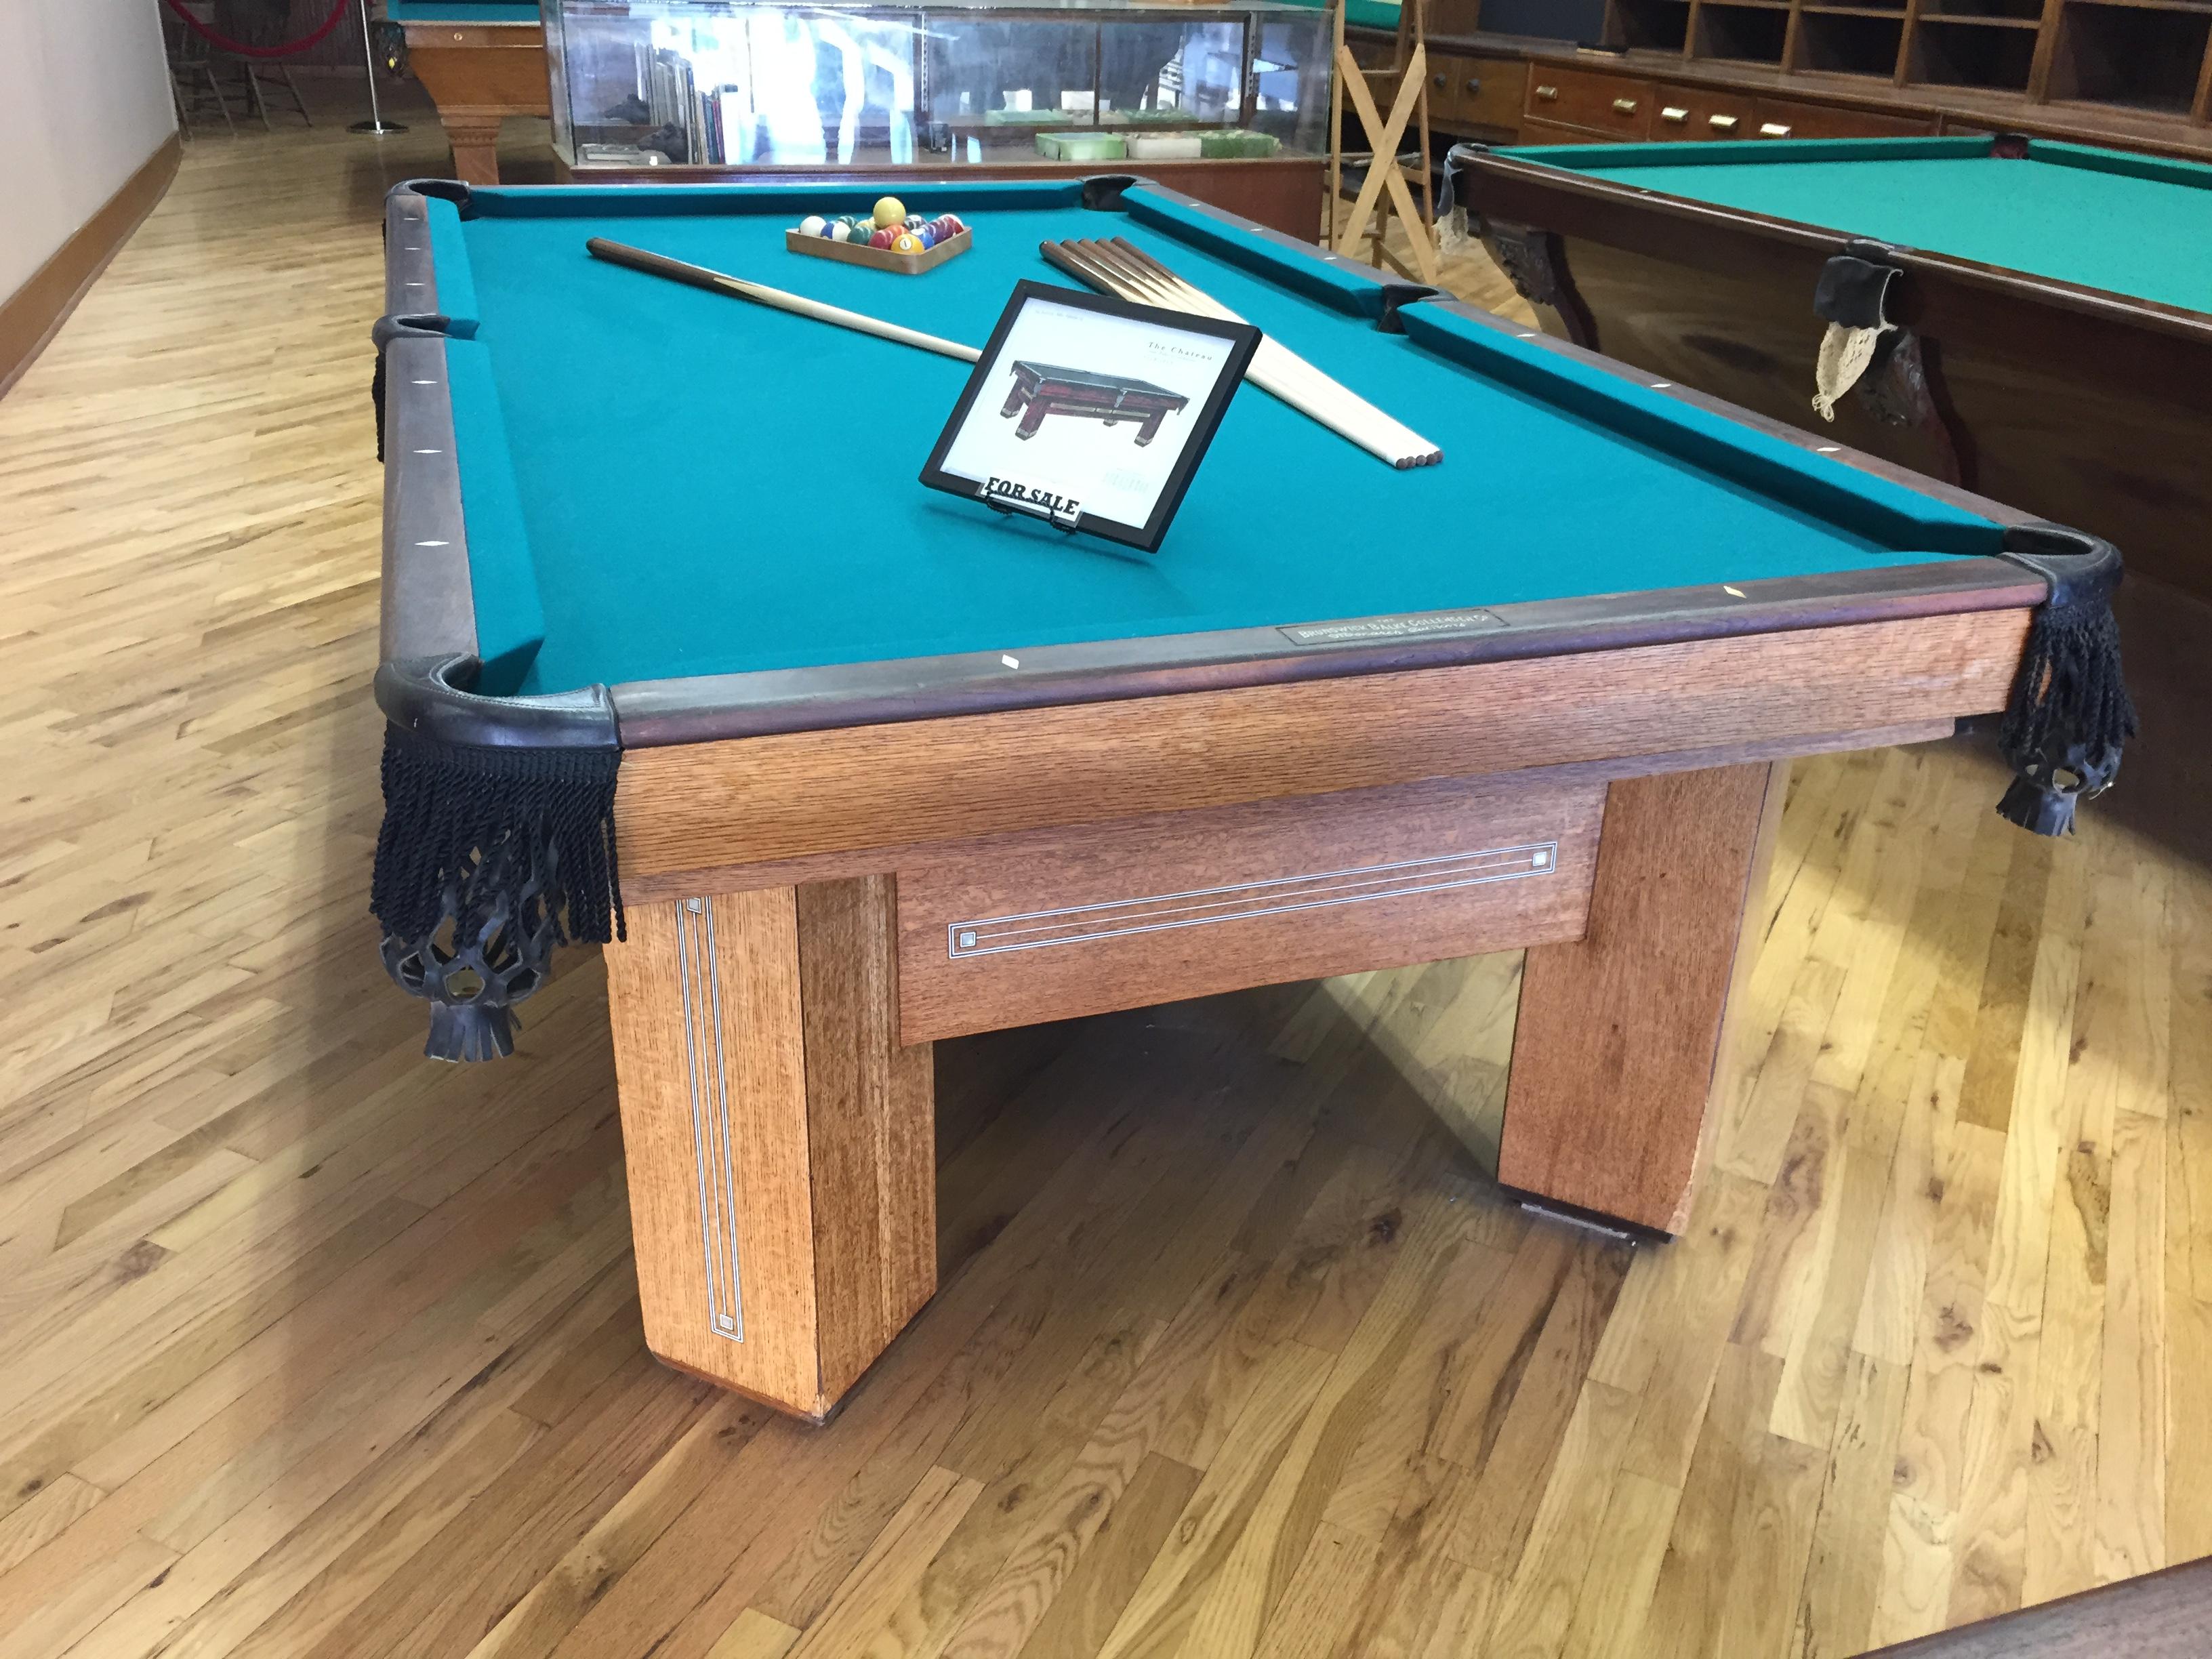 Cowboy Billiards The Chateau Antique Brunswick Pool Table - Brunswick chateau pool table